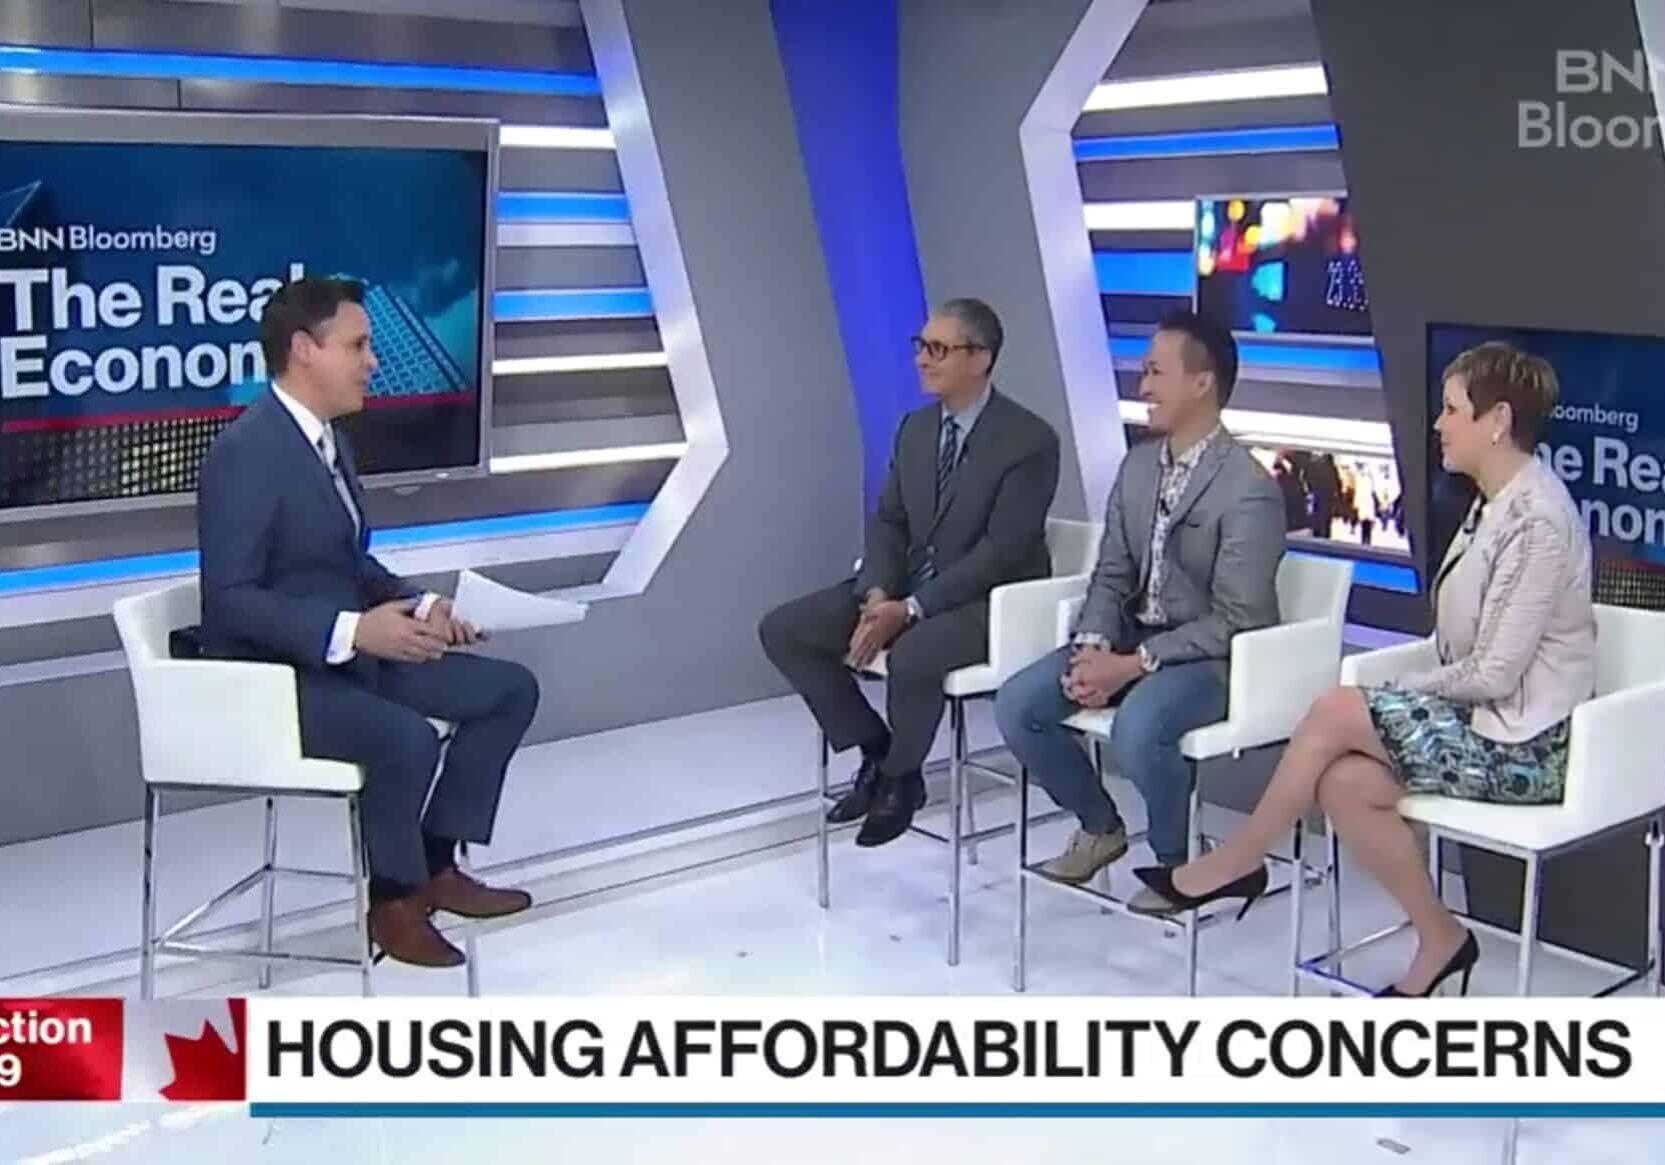 BNN Bloomberg housing affordability